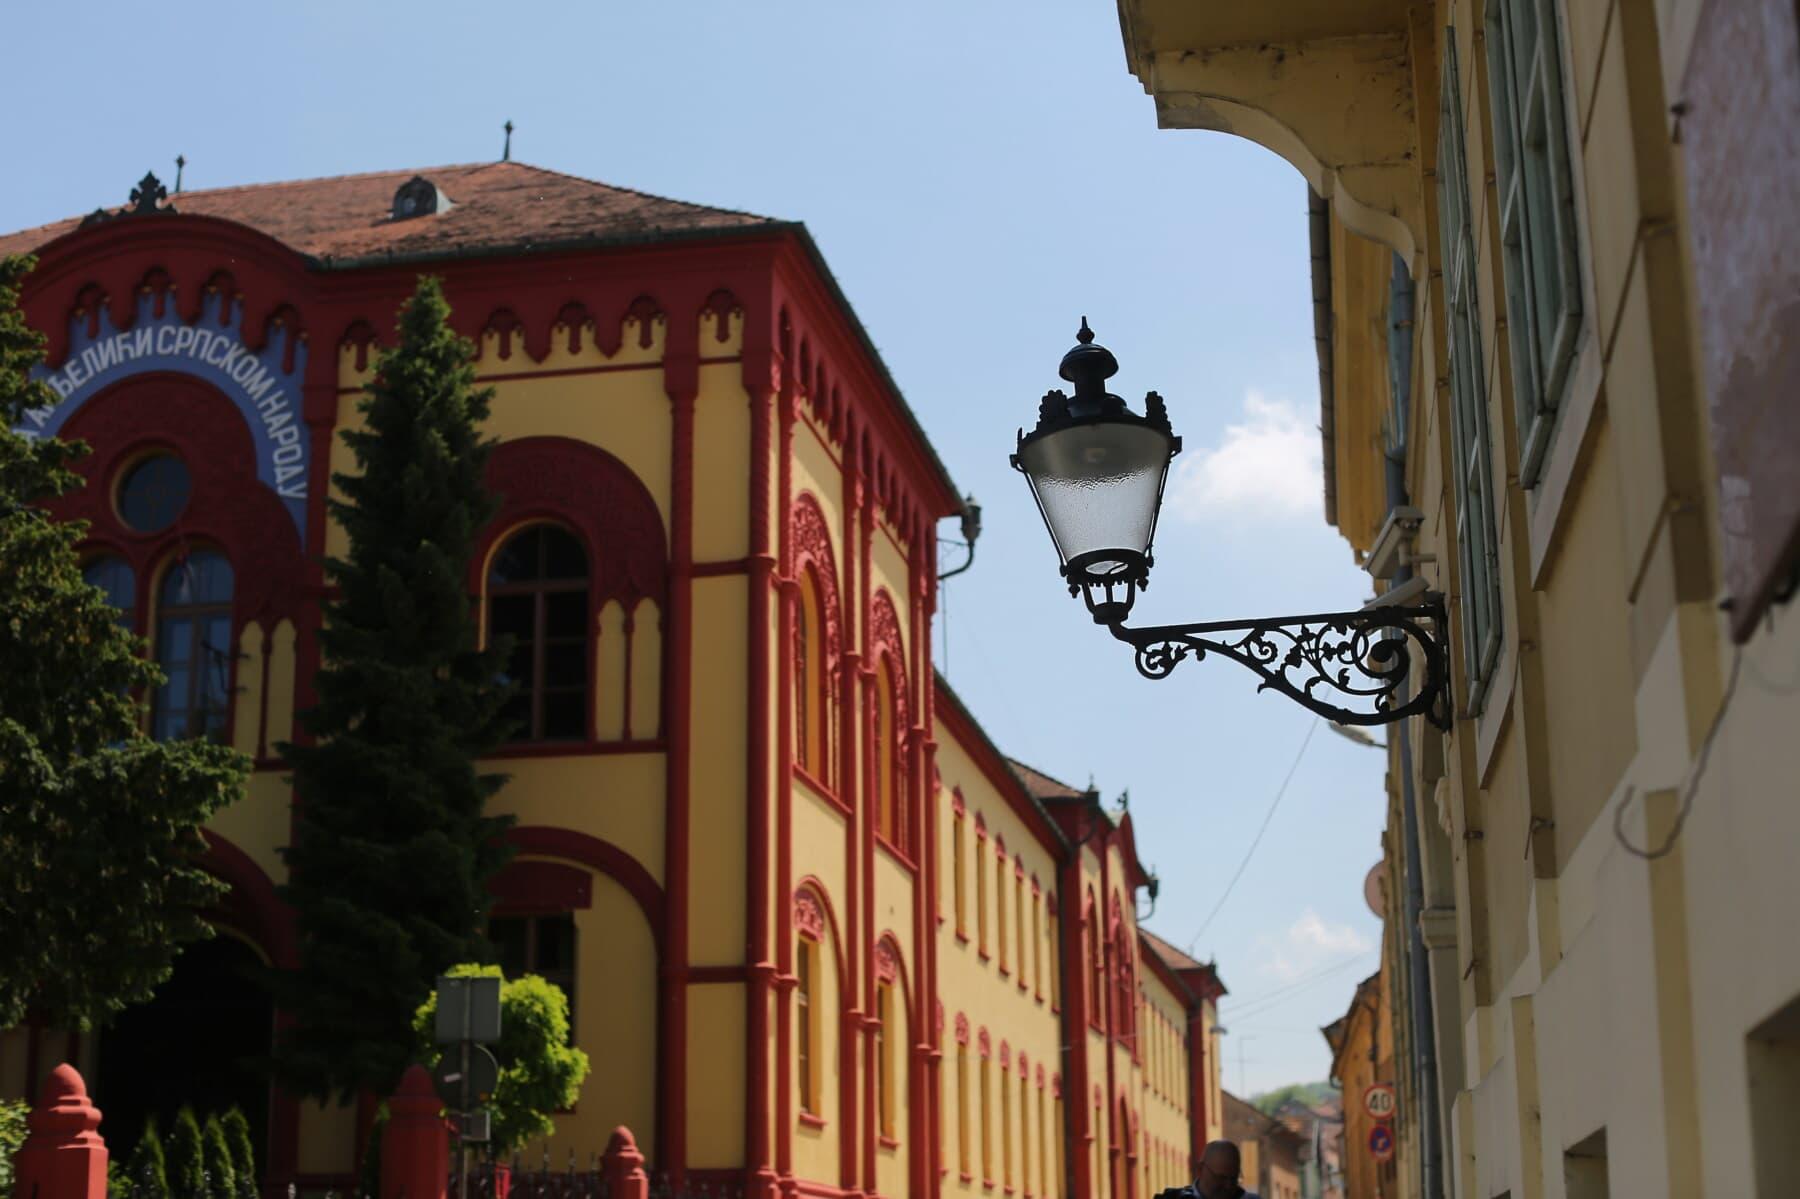 Sremski Karlovci, Srbija, starinsko, lanterna, lijevano željezo, arhitektonski stil, zgrada, barok, arhitektura, zgrada